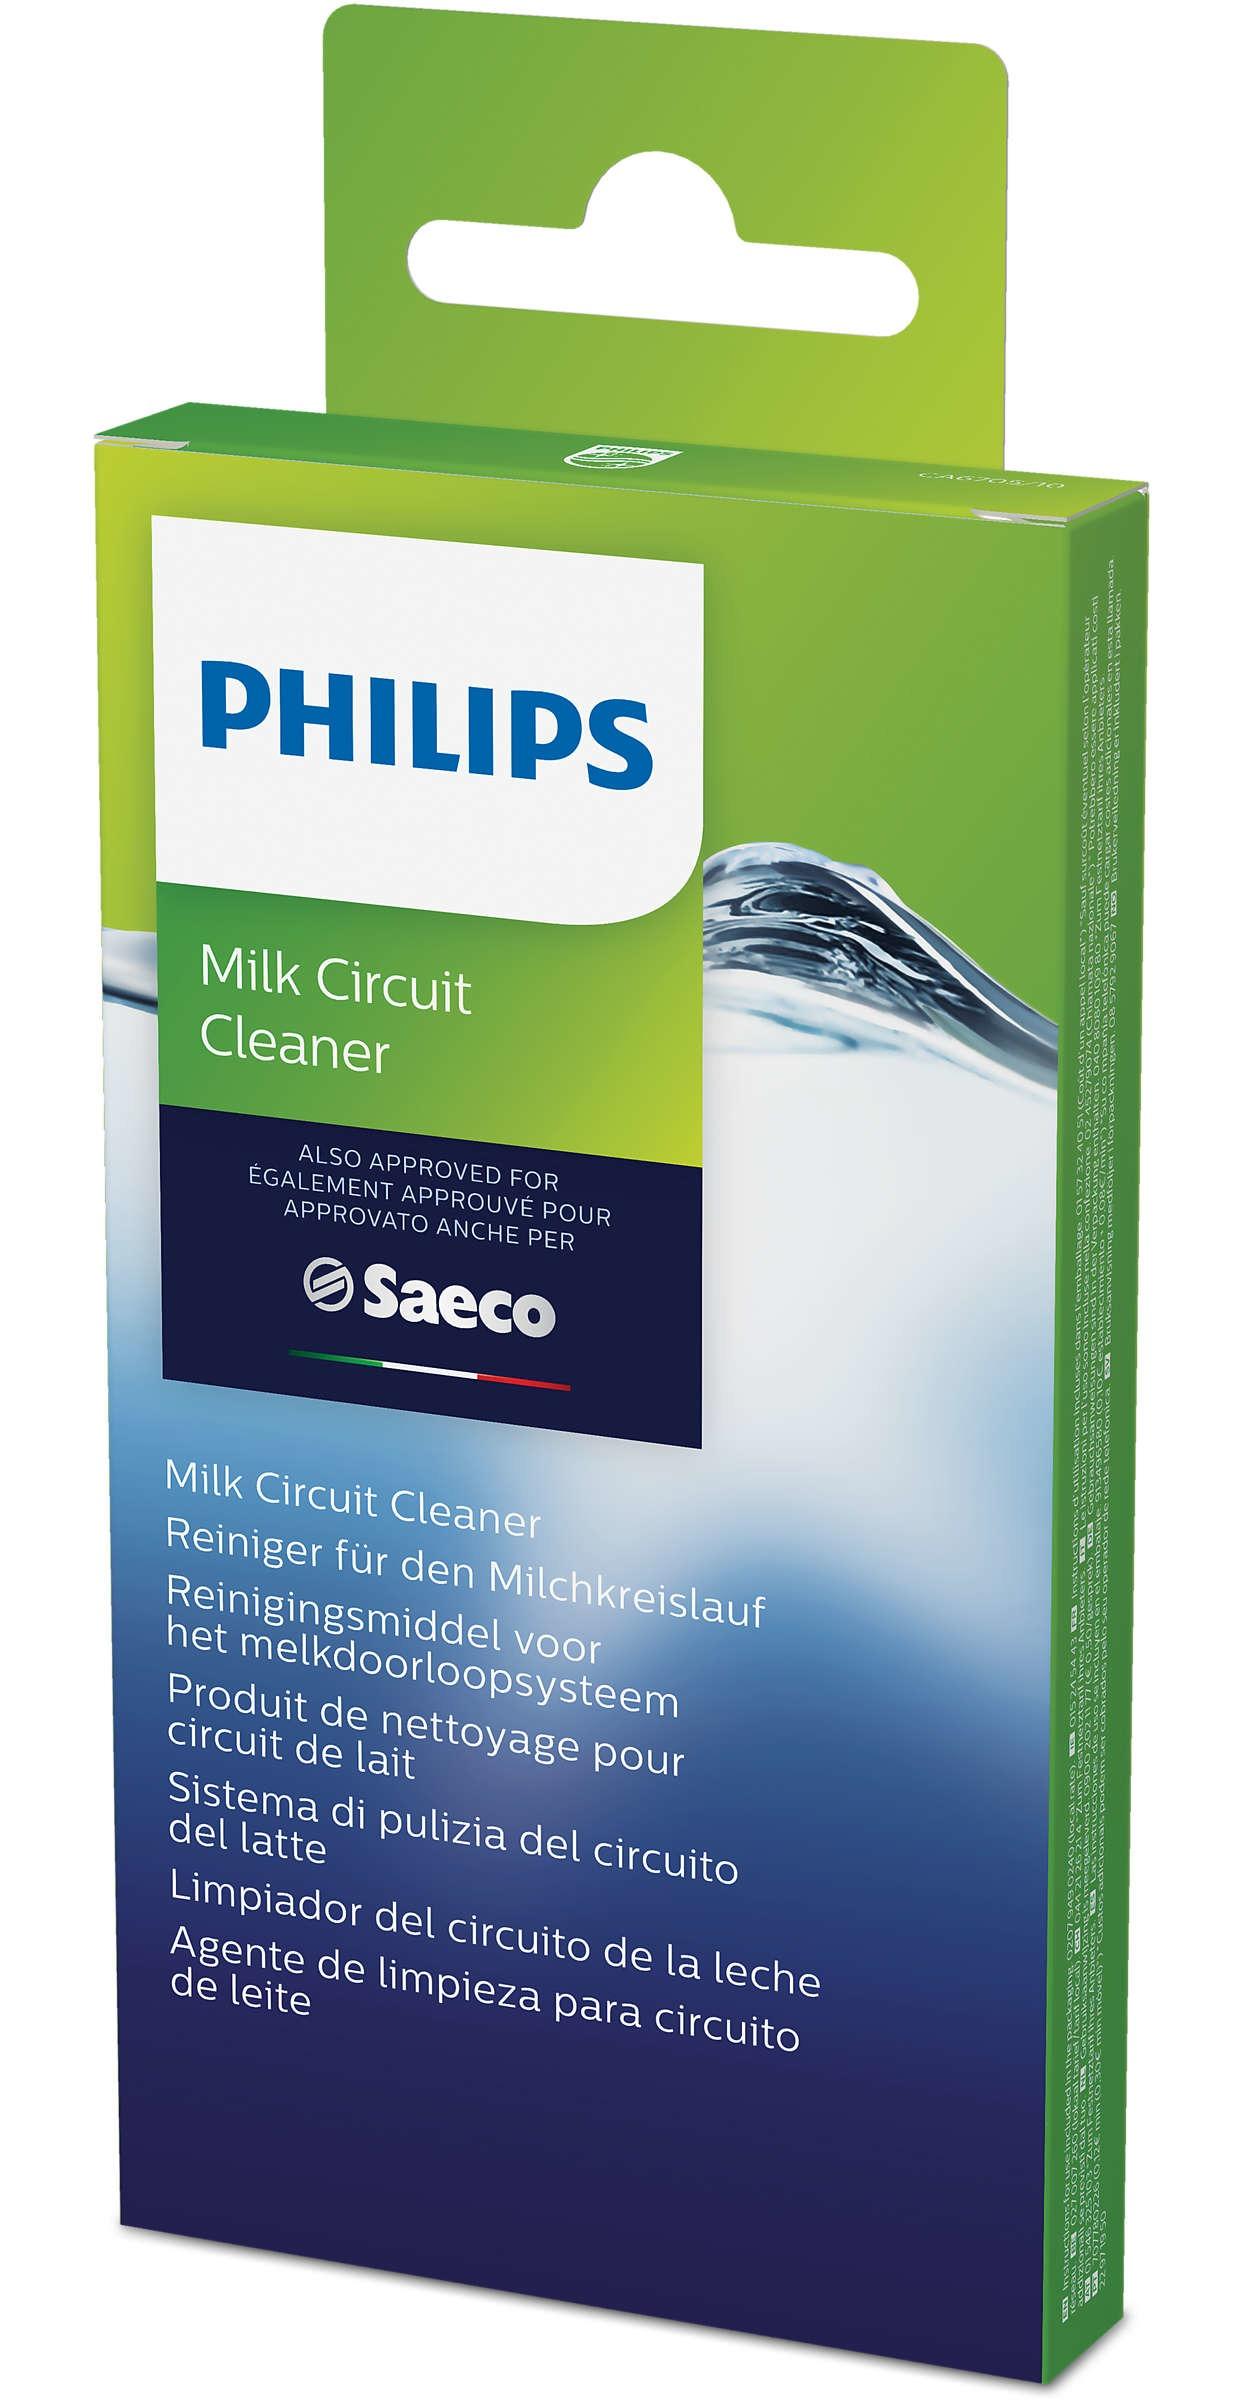 Philips koffie accessoire CA6705 10